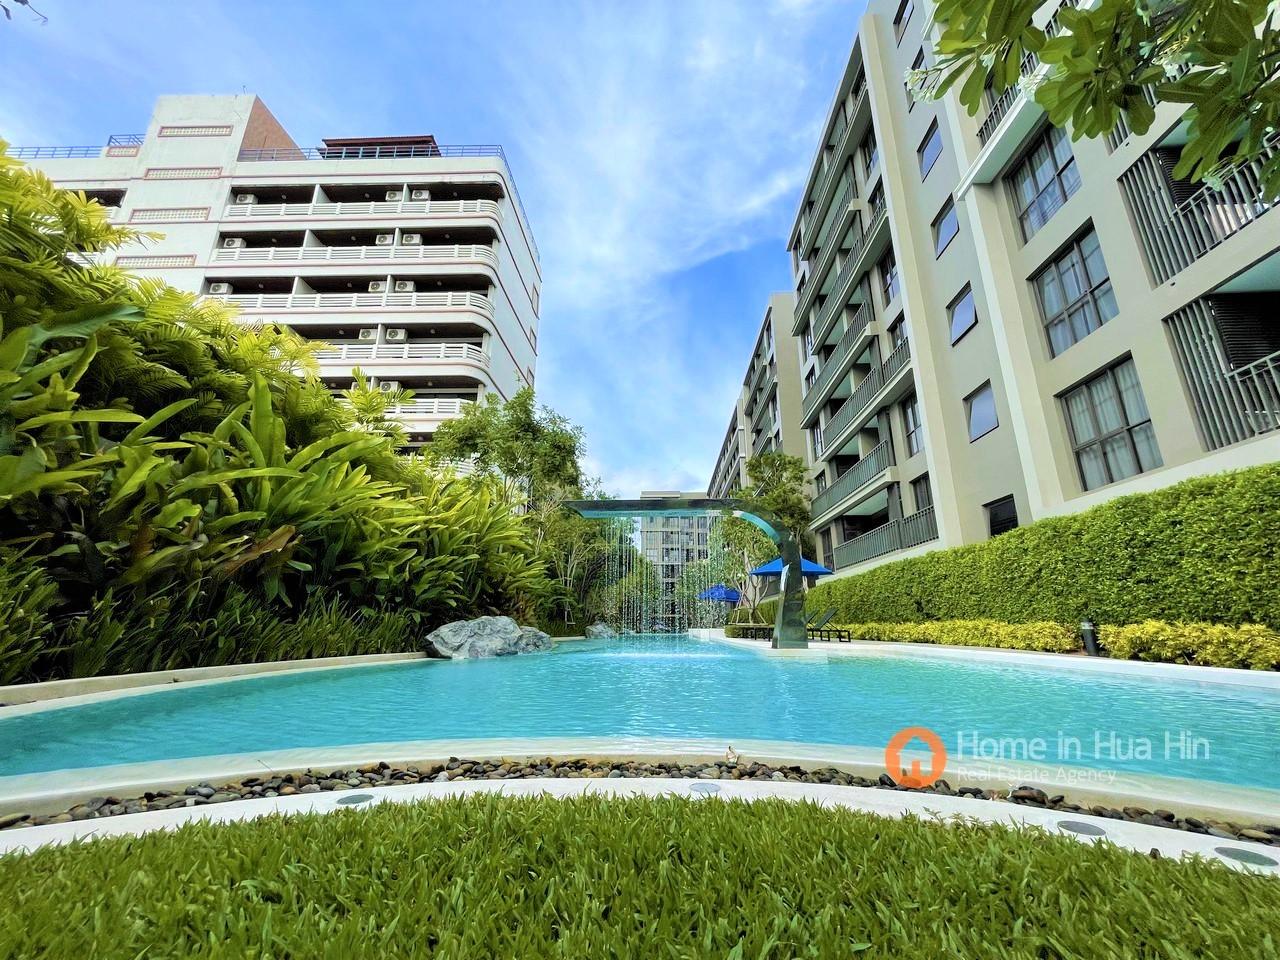 1 Bedroom Hua Hin Apartment for Sale Marvest Hua Hin Condo